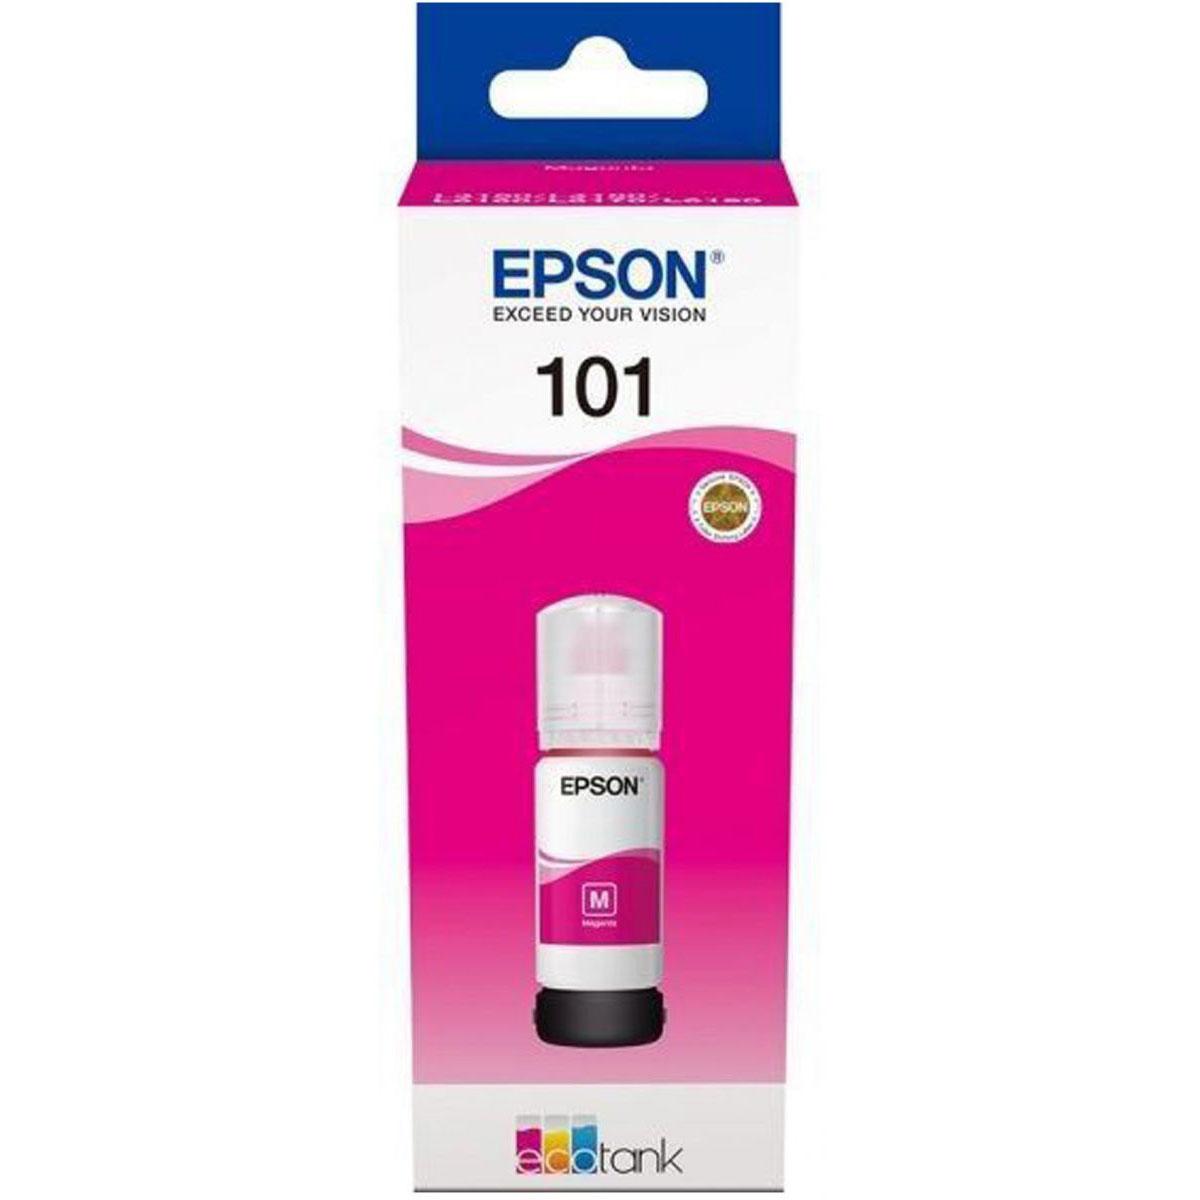 Epson 101 EcoTank Ink Cartridge (C13T03V34A) 70ml - Magenta